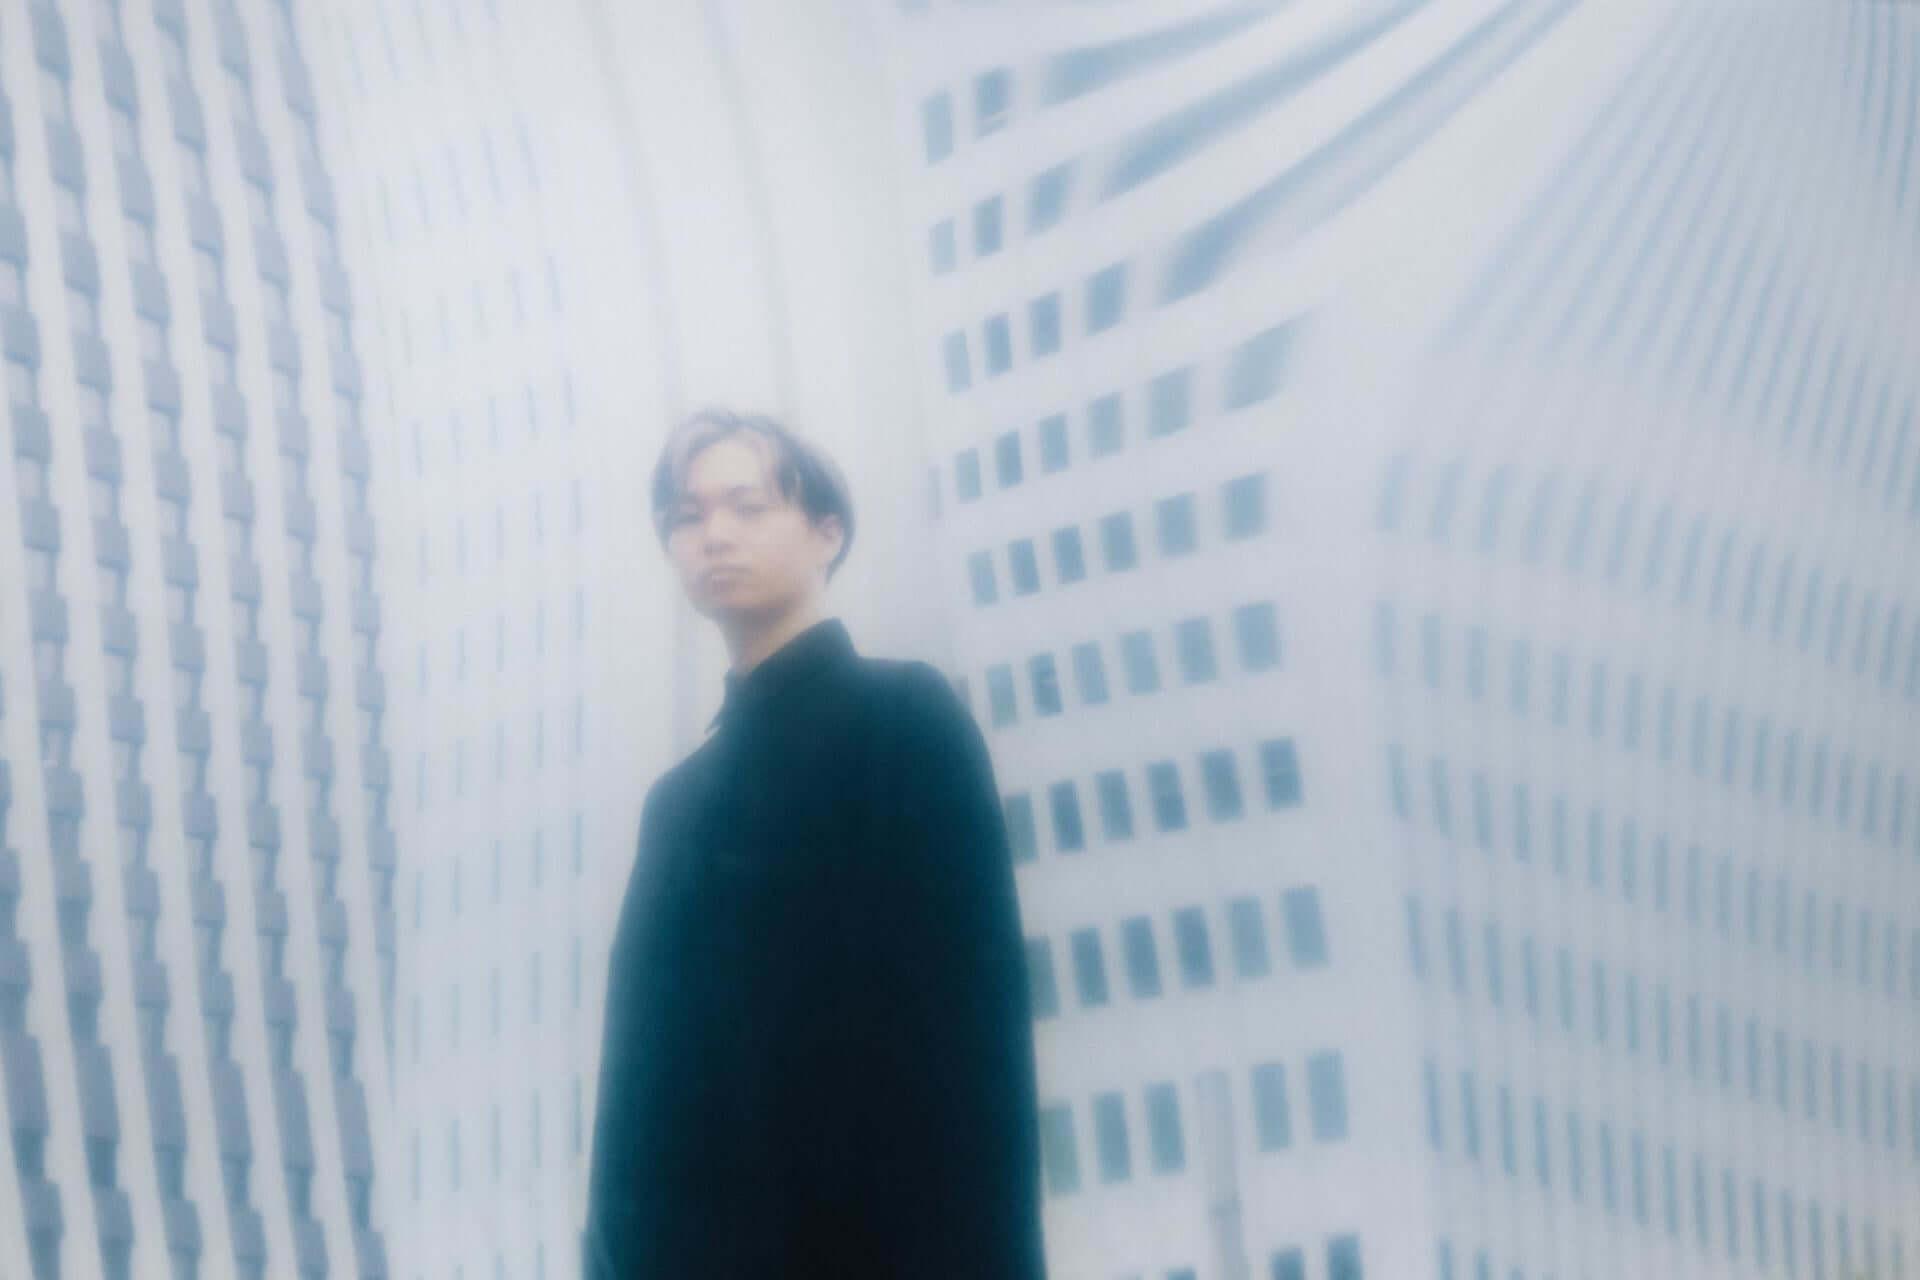 "Kei Matsumaru最新作『Nothing Unspoken Under the Sun』より収録曲""it say, no sé""のMVが公開!監督は垂水佳菜 music201124_kei-matsumaru_5-1920x1280"